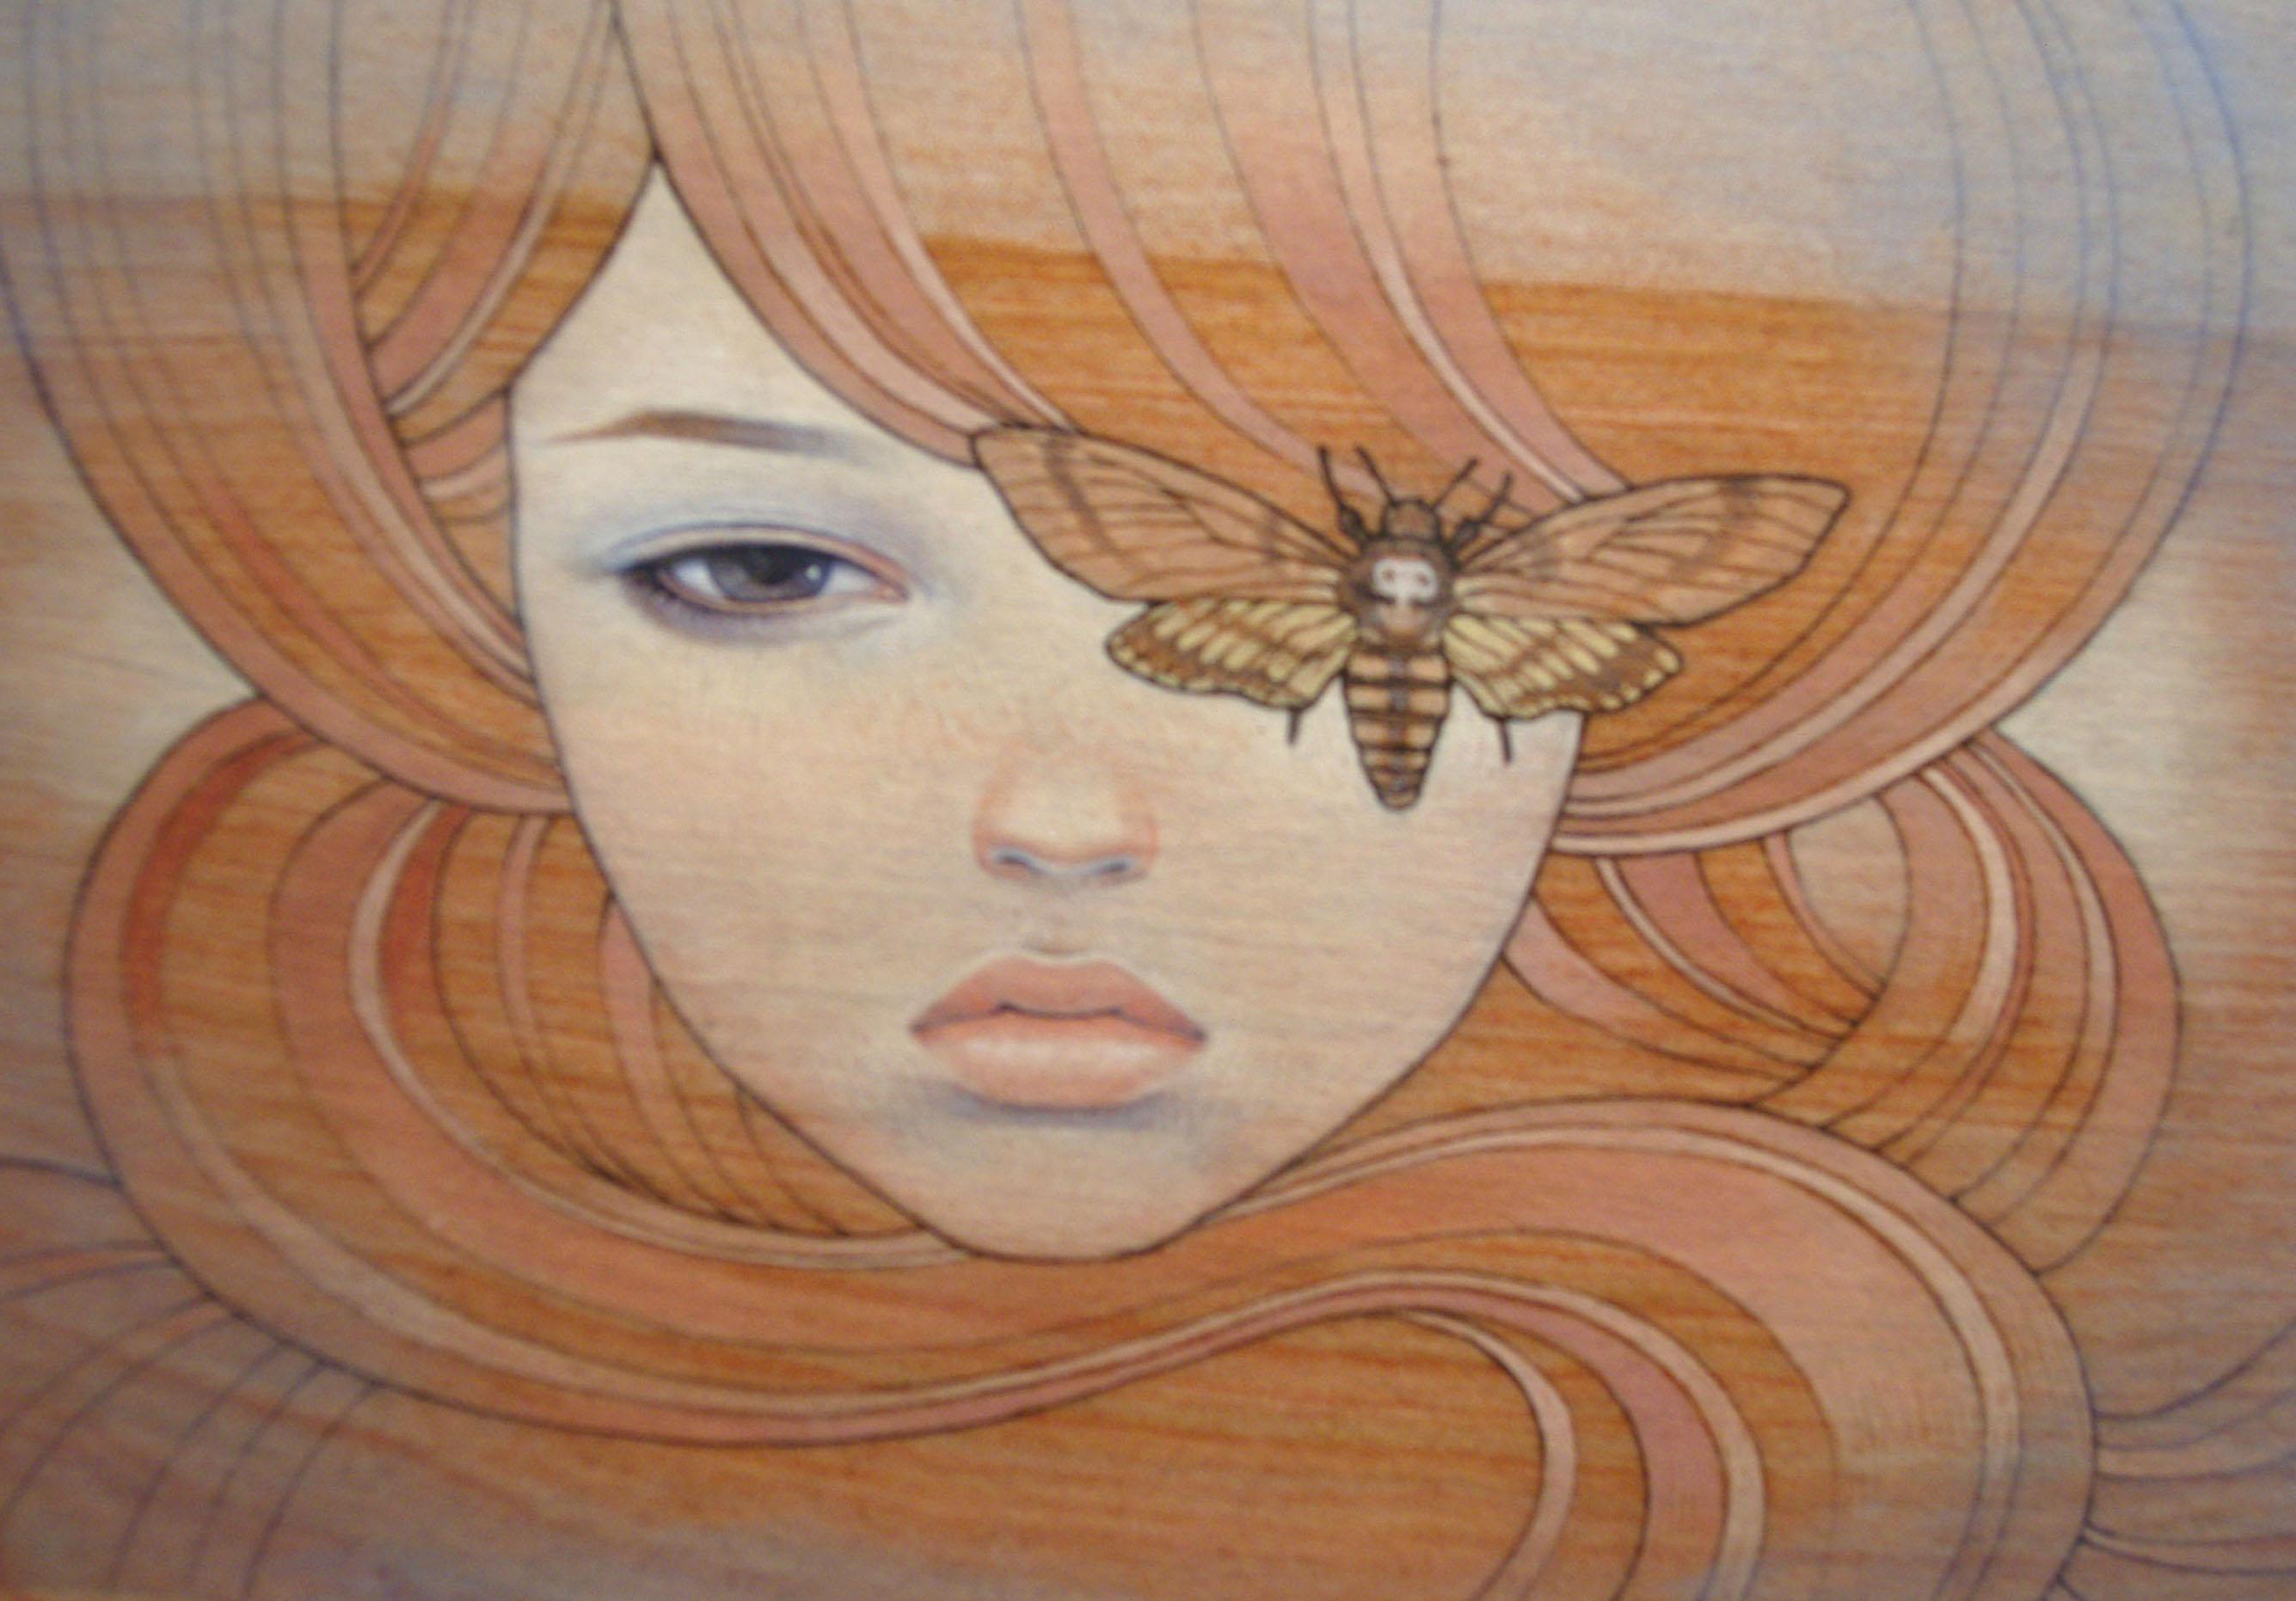 Wallpaper : face, drawing, painting, illustration, portrait, artwork, head, Japanese Art, ART, girl, artworks, modern art, fictional character, ...